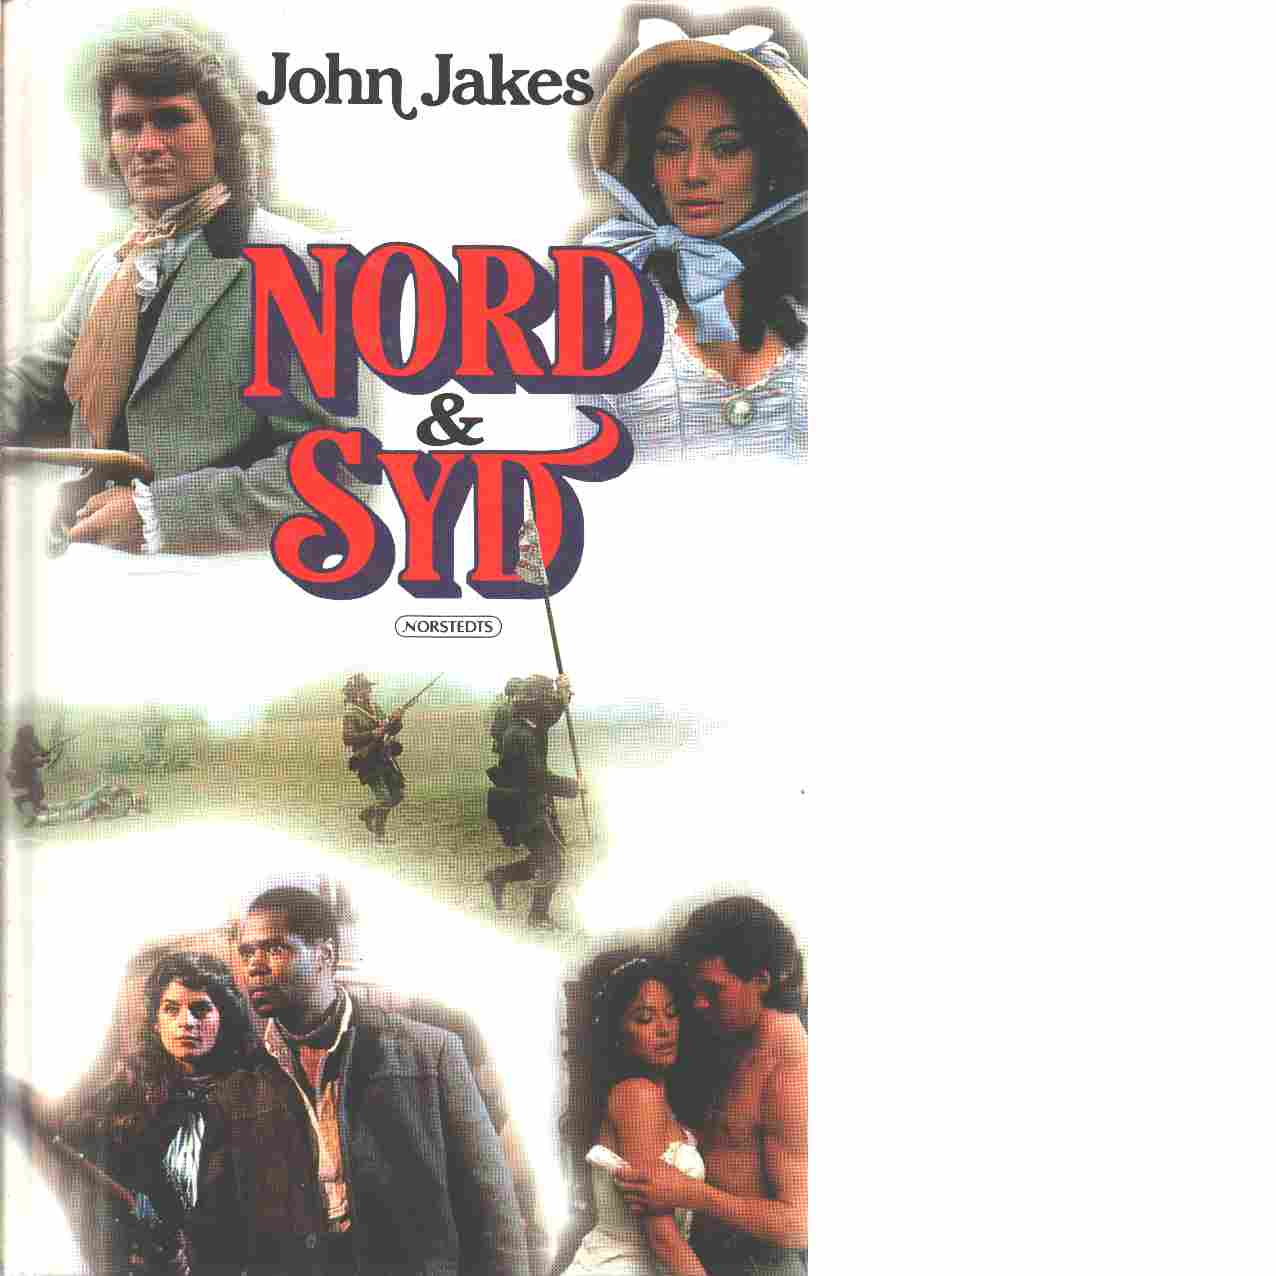 Nord & syd - Jakes, John